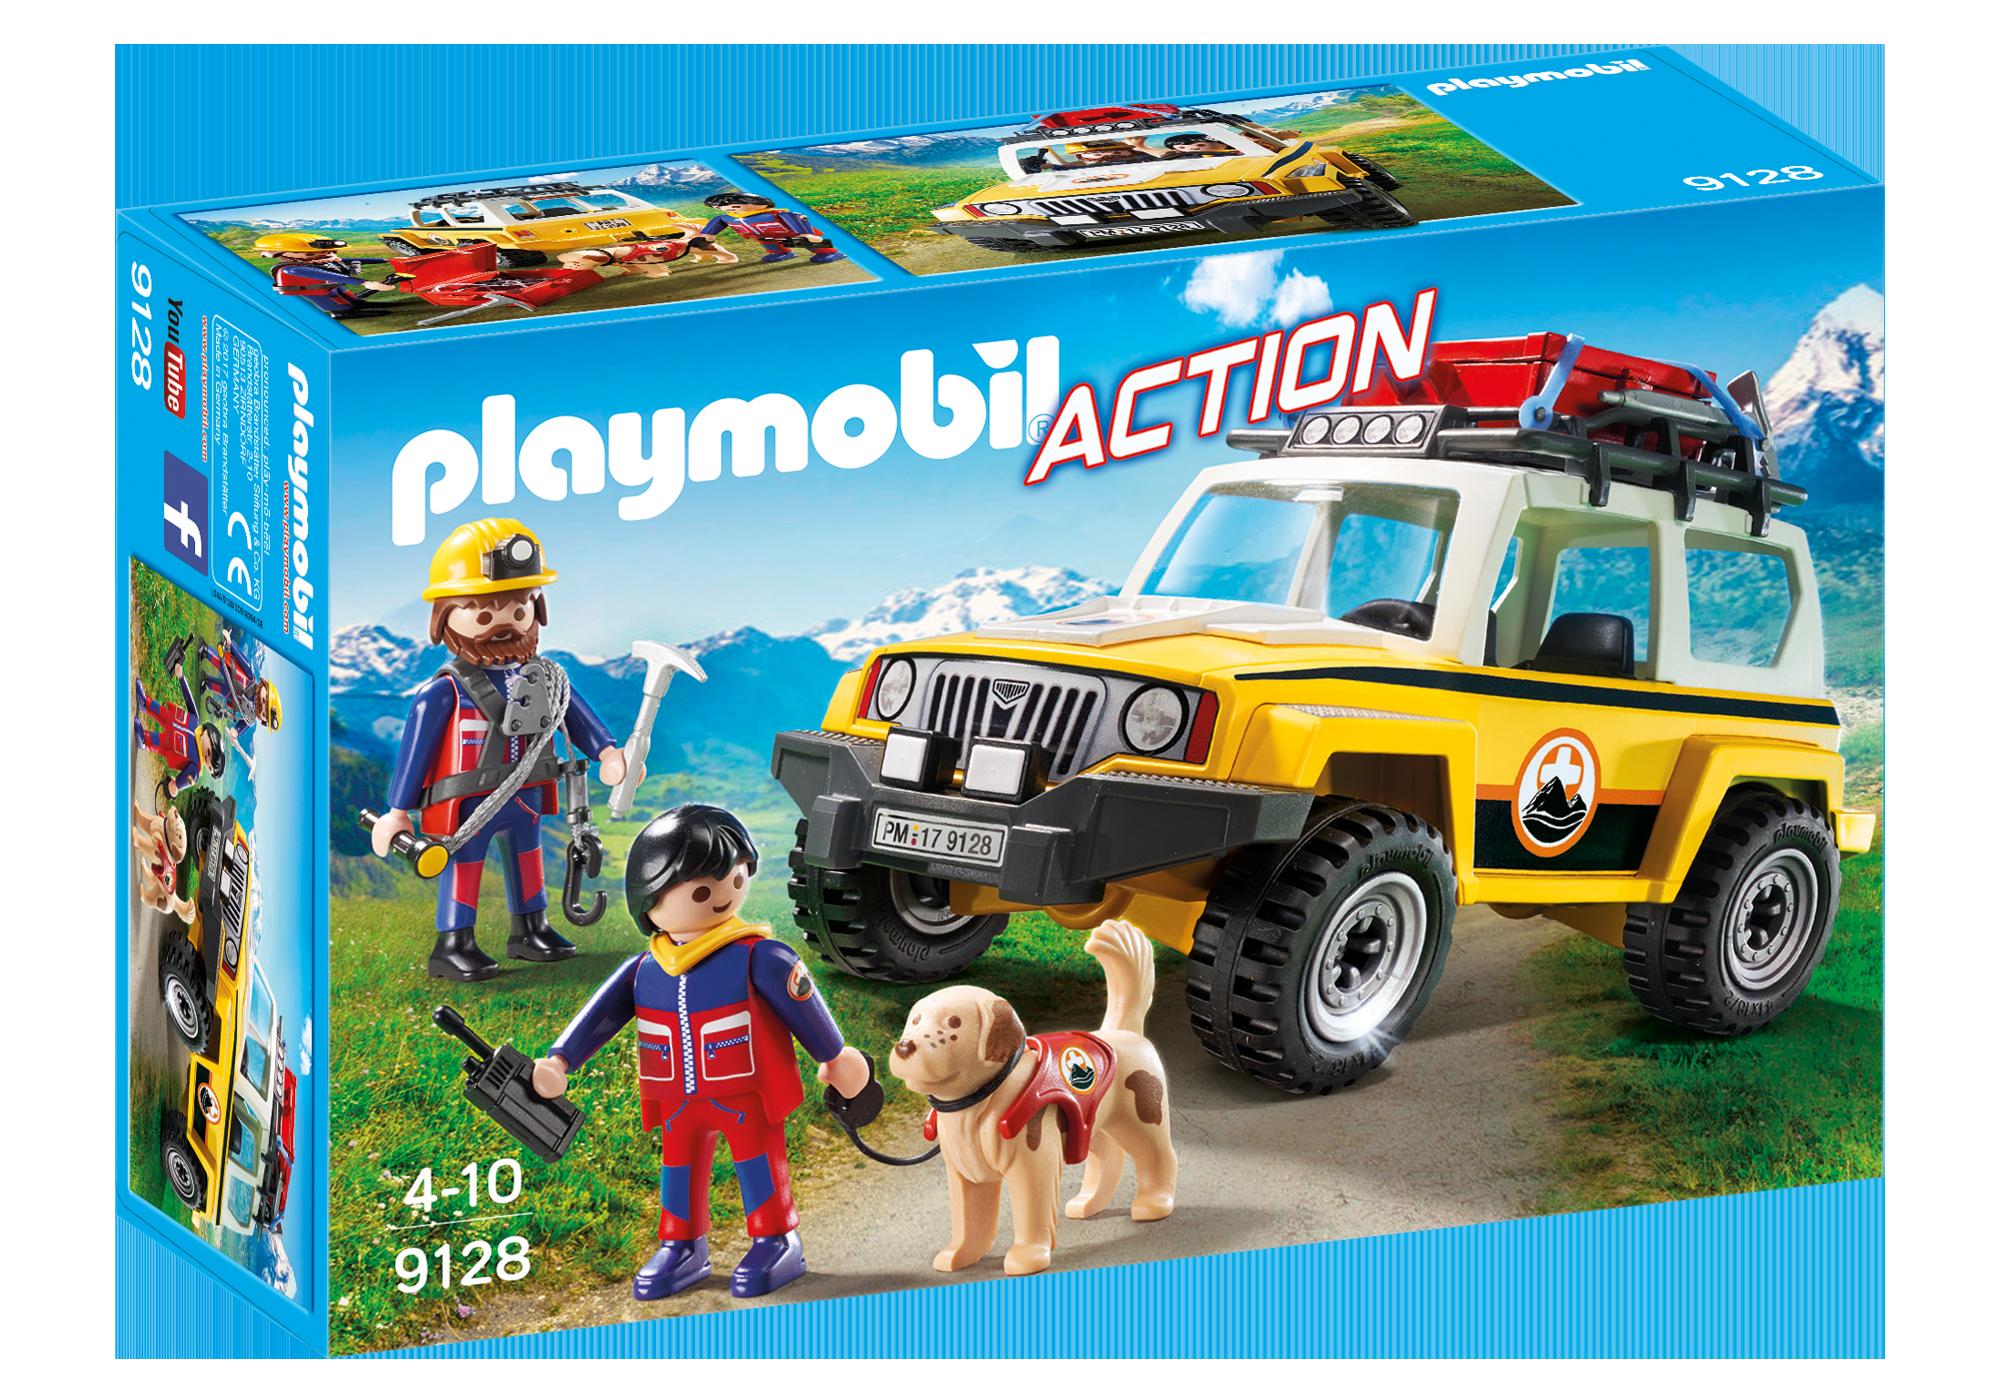 http://media.playmobil.com/i/playmobil/9128_product_box_front/Secouristes des montagnes avec véhicule